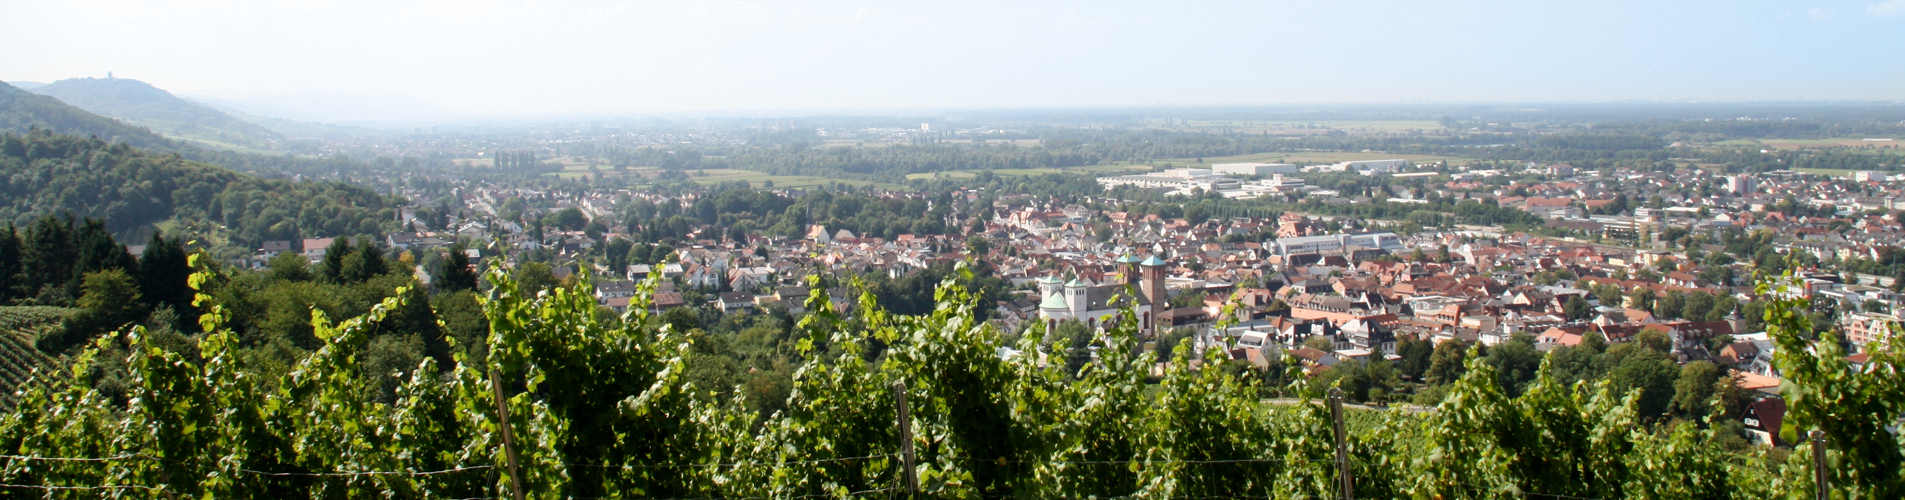 Verbandsgebiet Bensheim